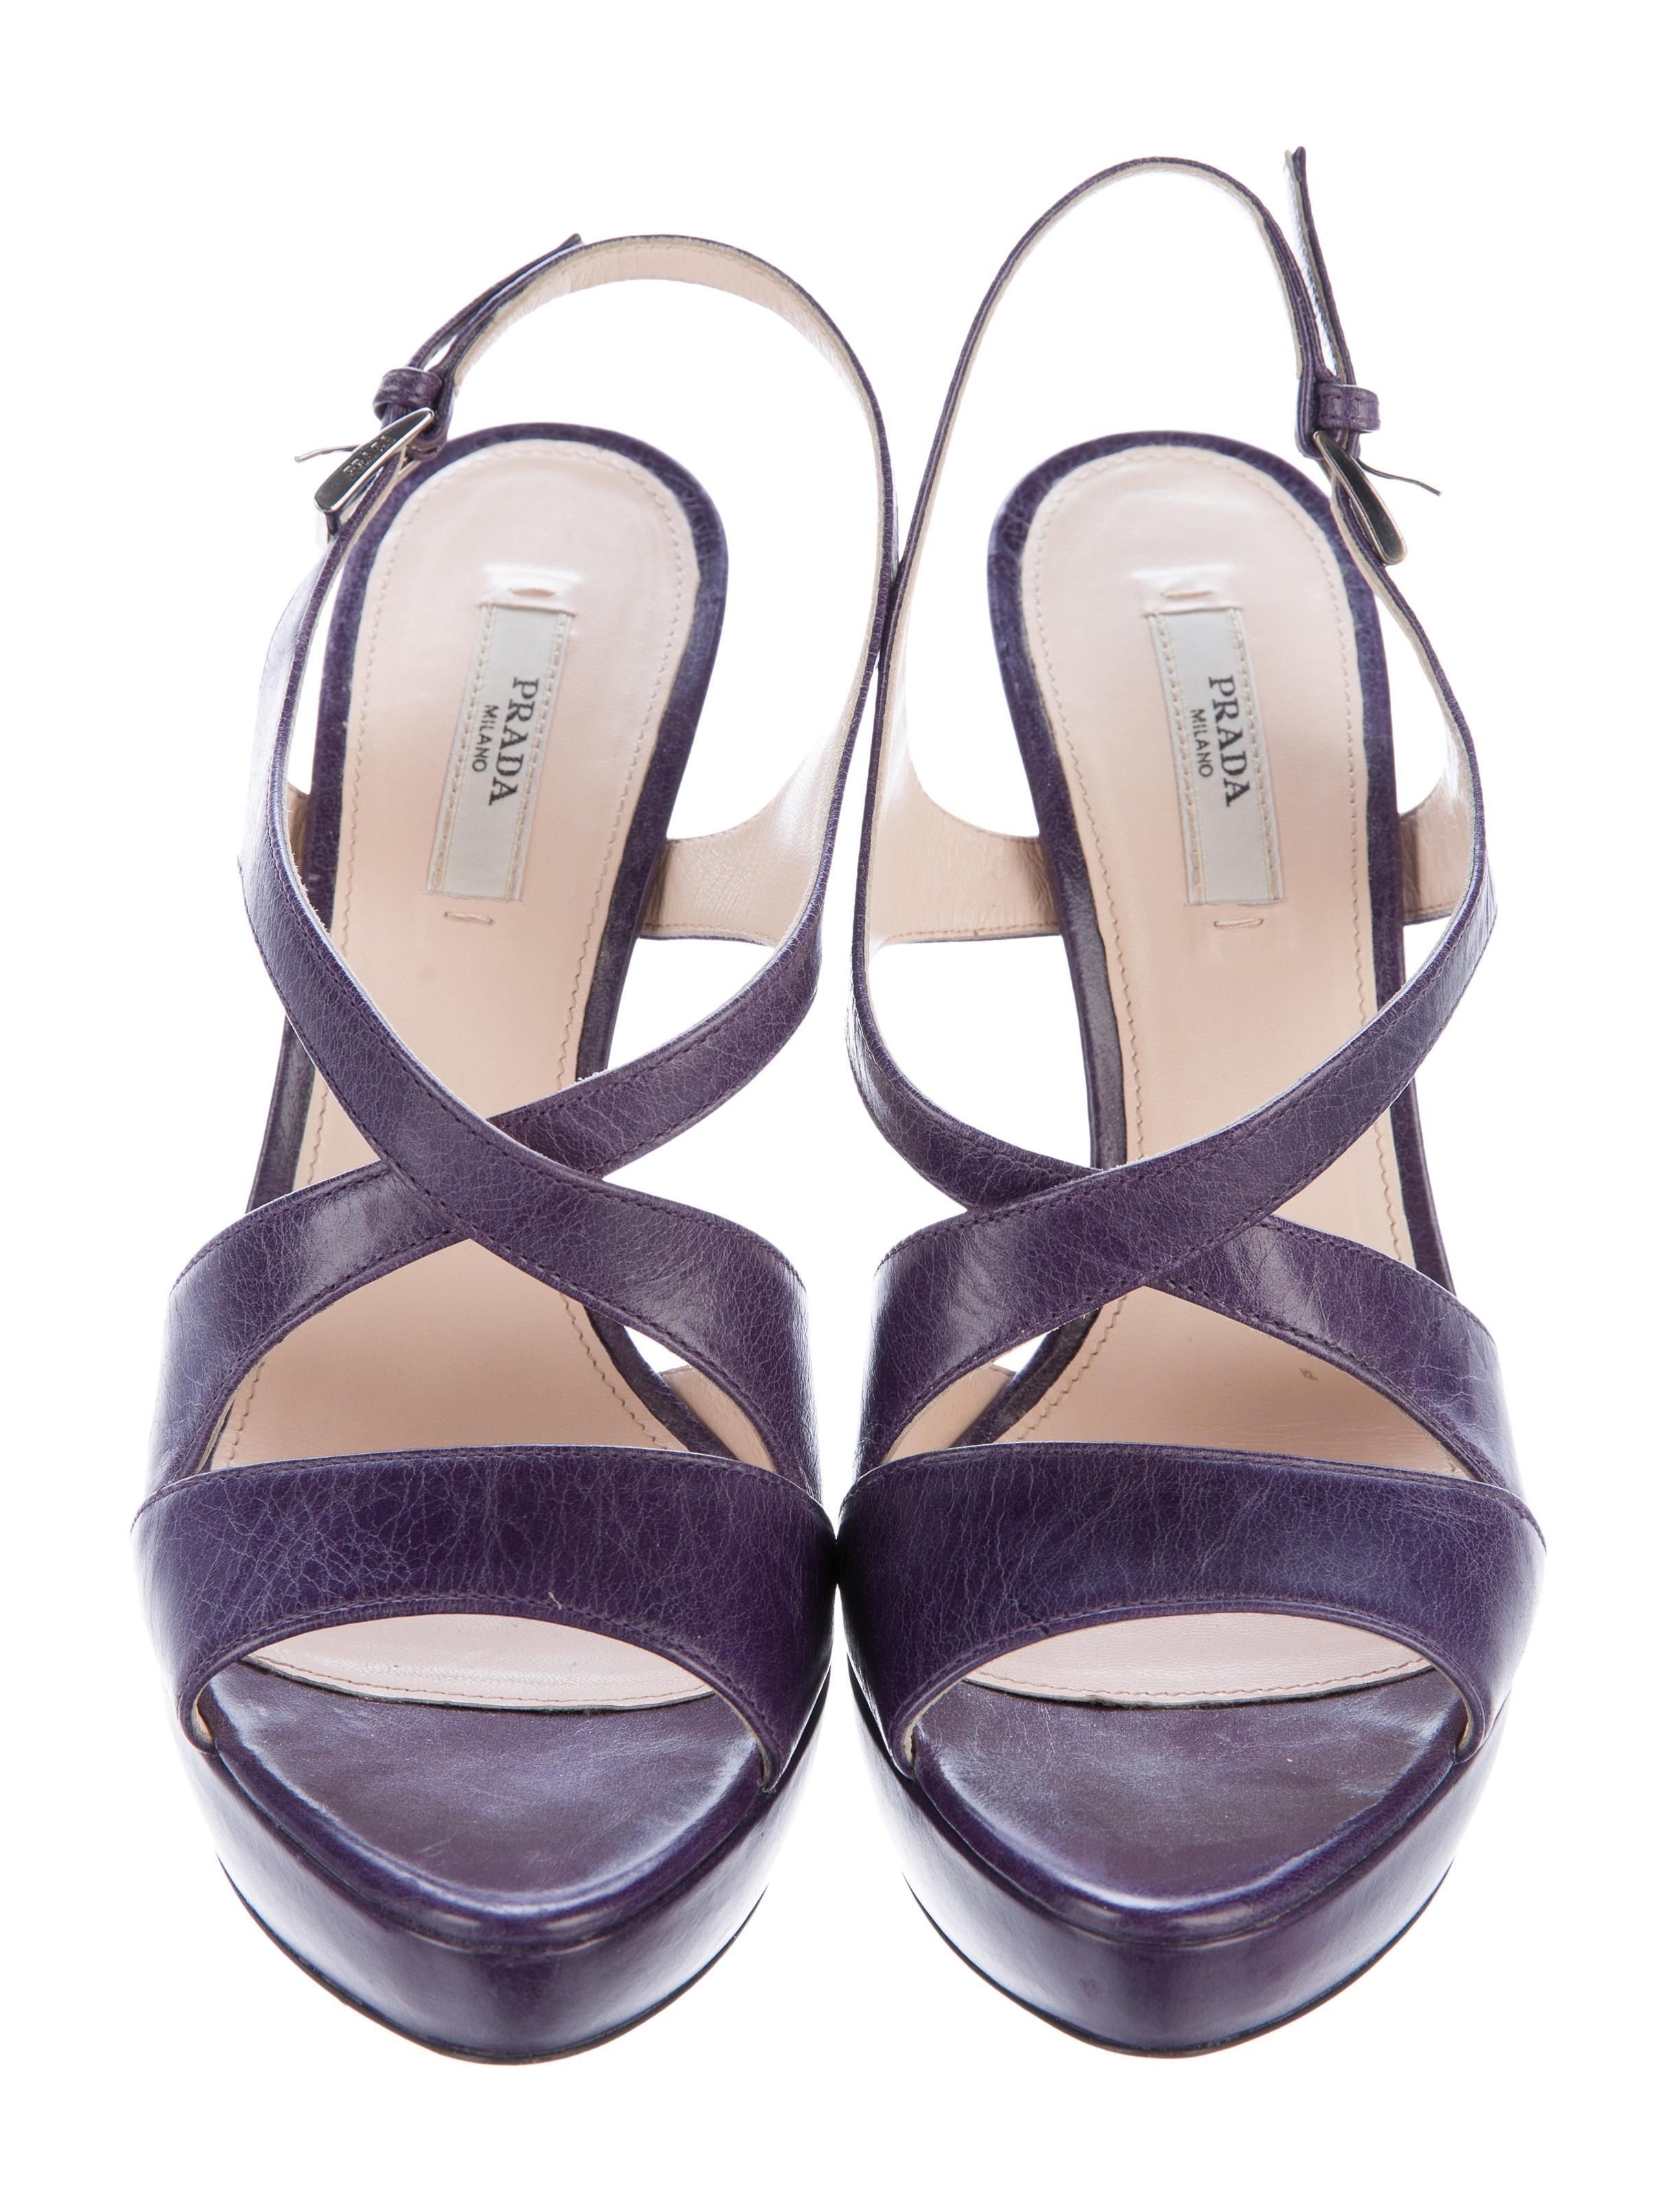 prada cross platform sandals shoes pra150254